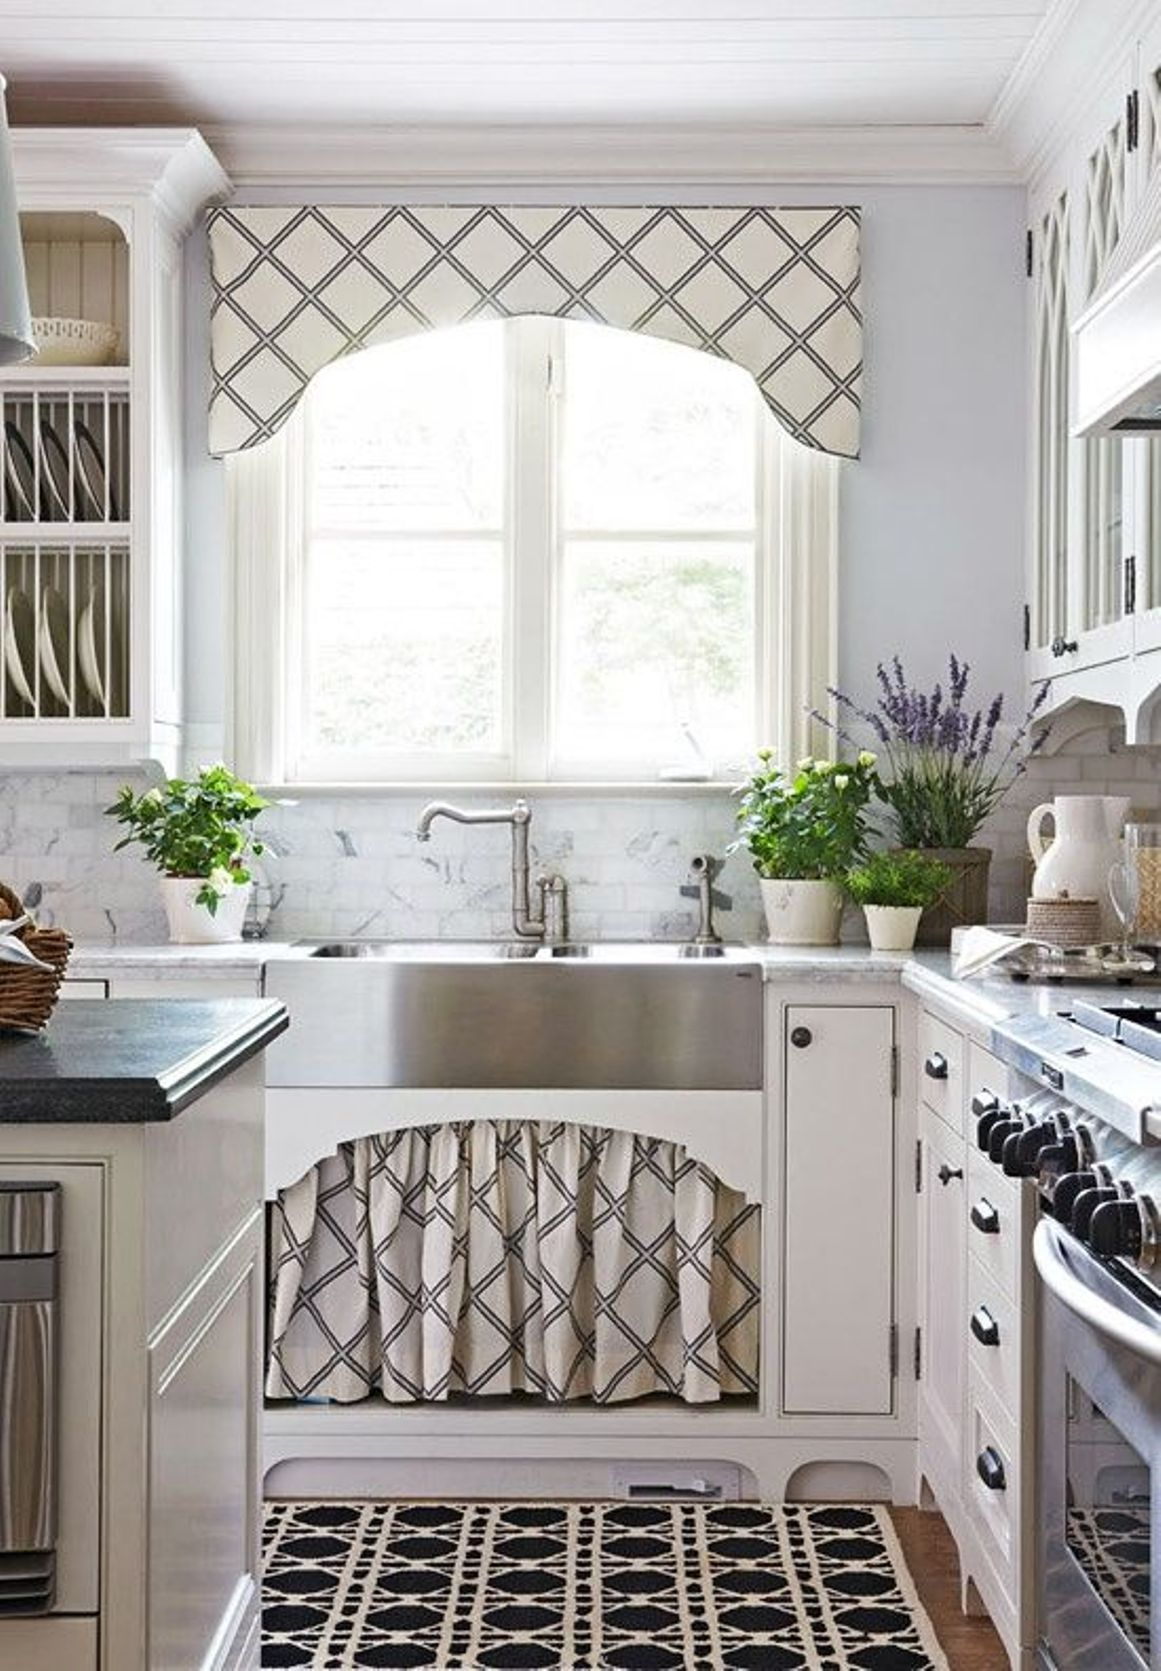 Superb Brilliant Kitchen Grommet Curtains And Small Kitchen Interior Design With  For Kitchen Valances